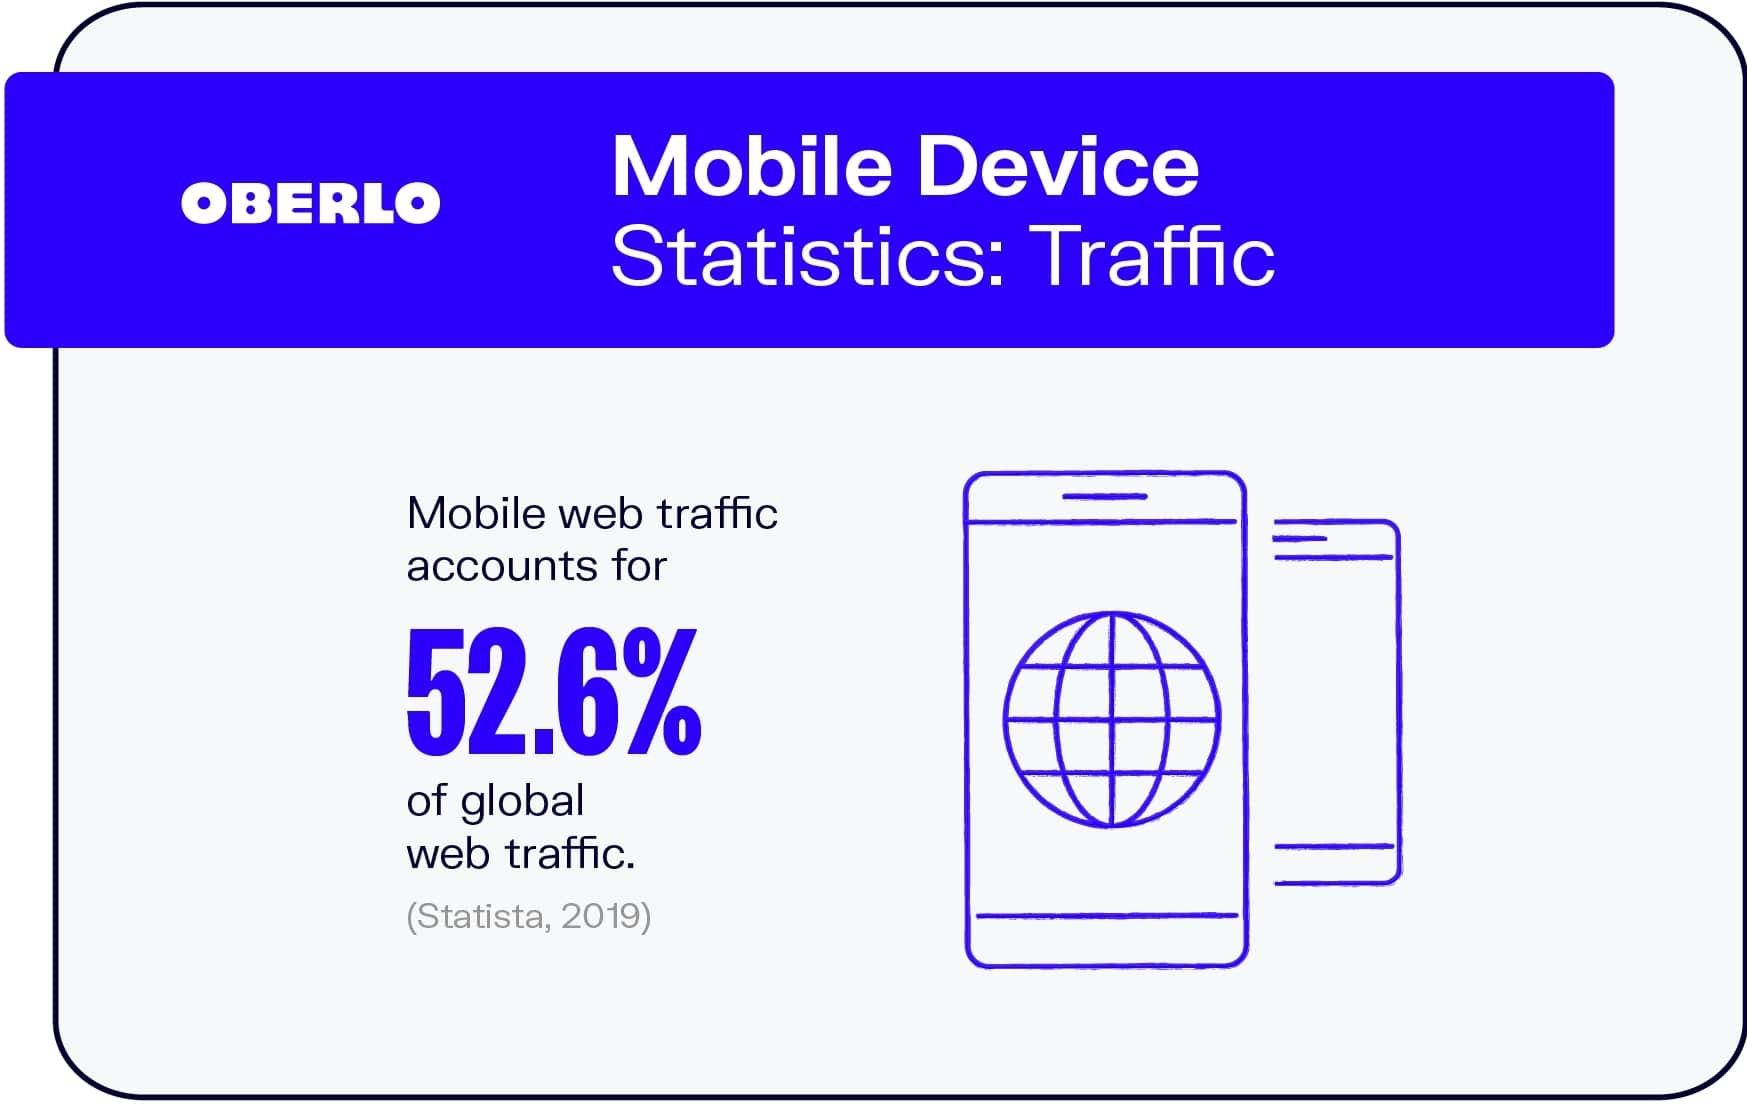 Mobile Device Statistics: Traffic